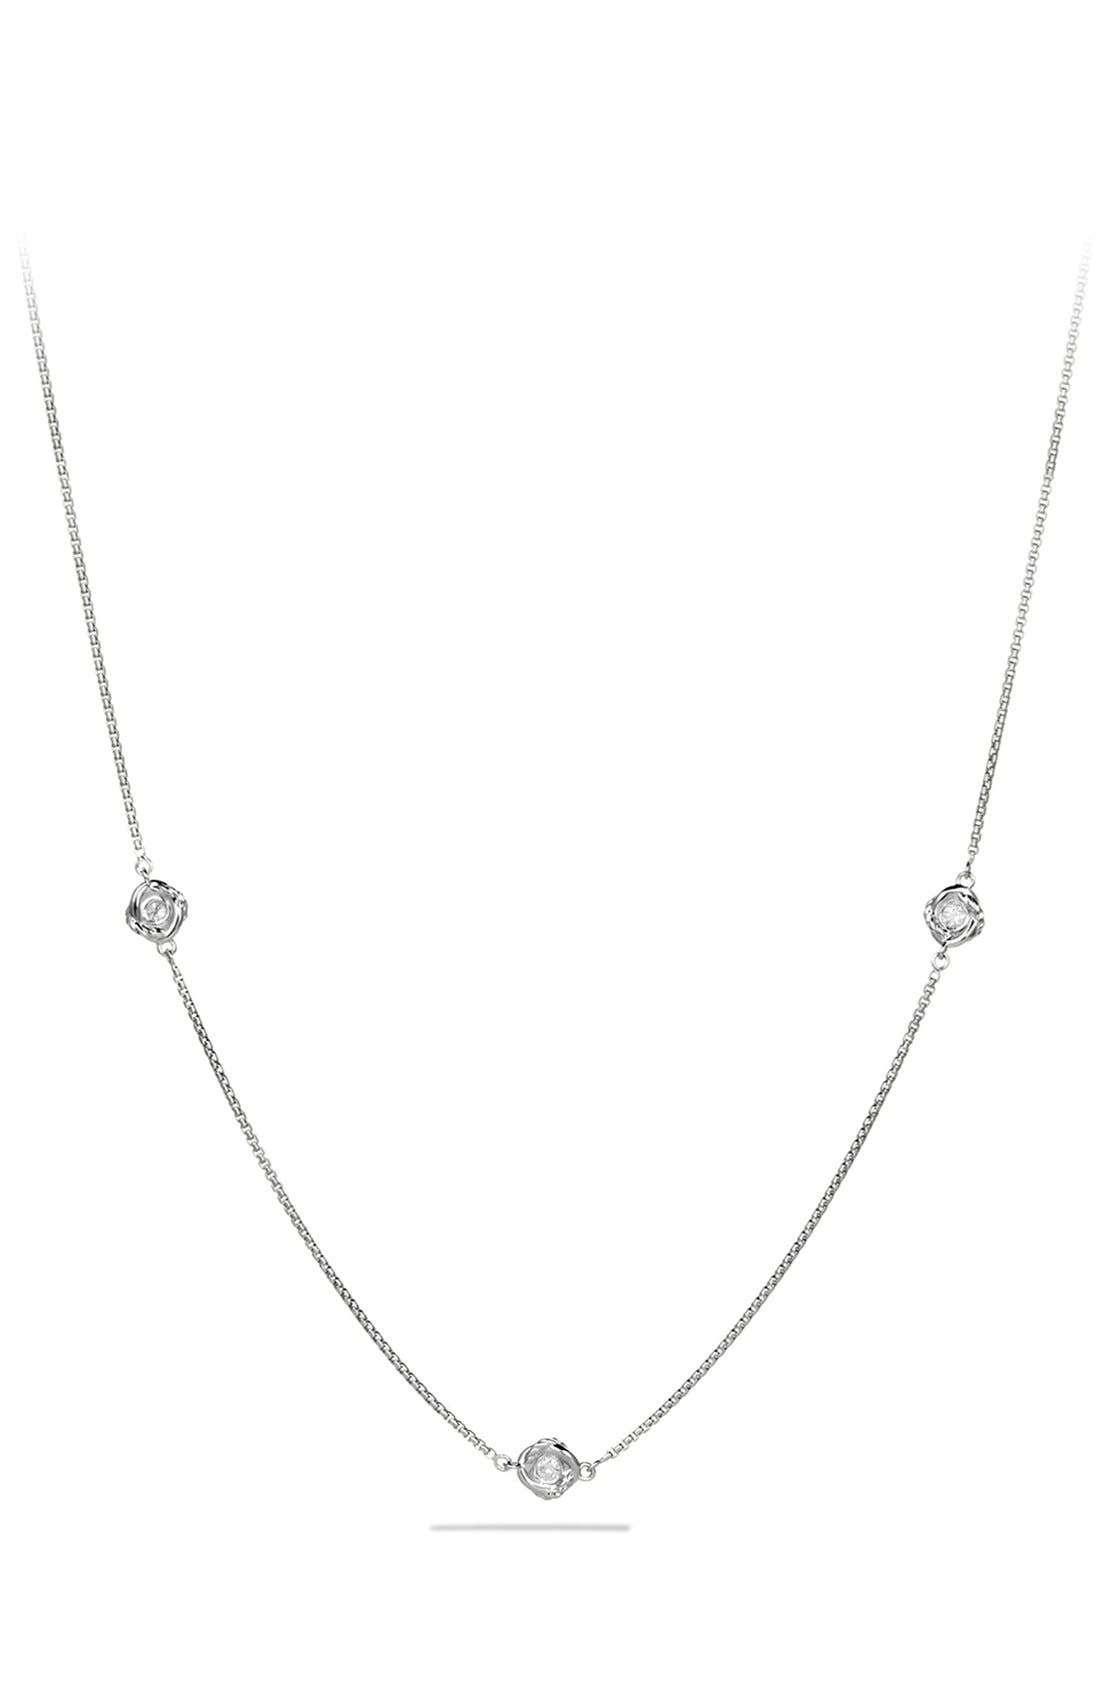 Main Image - David Yurman 'Infinity' Necklace with Diamonds